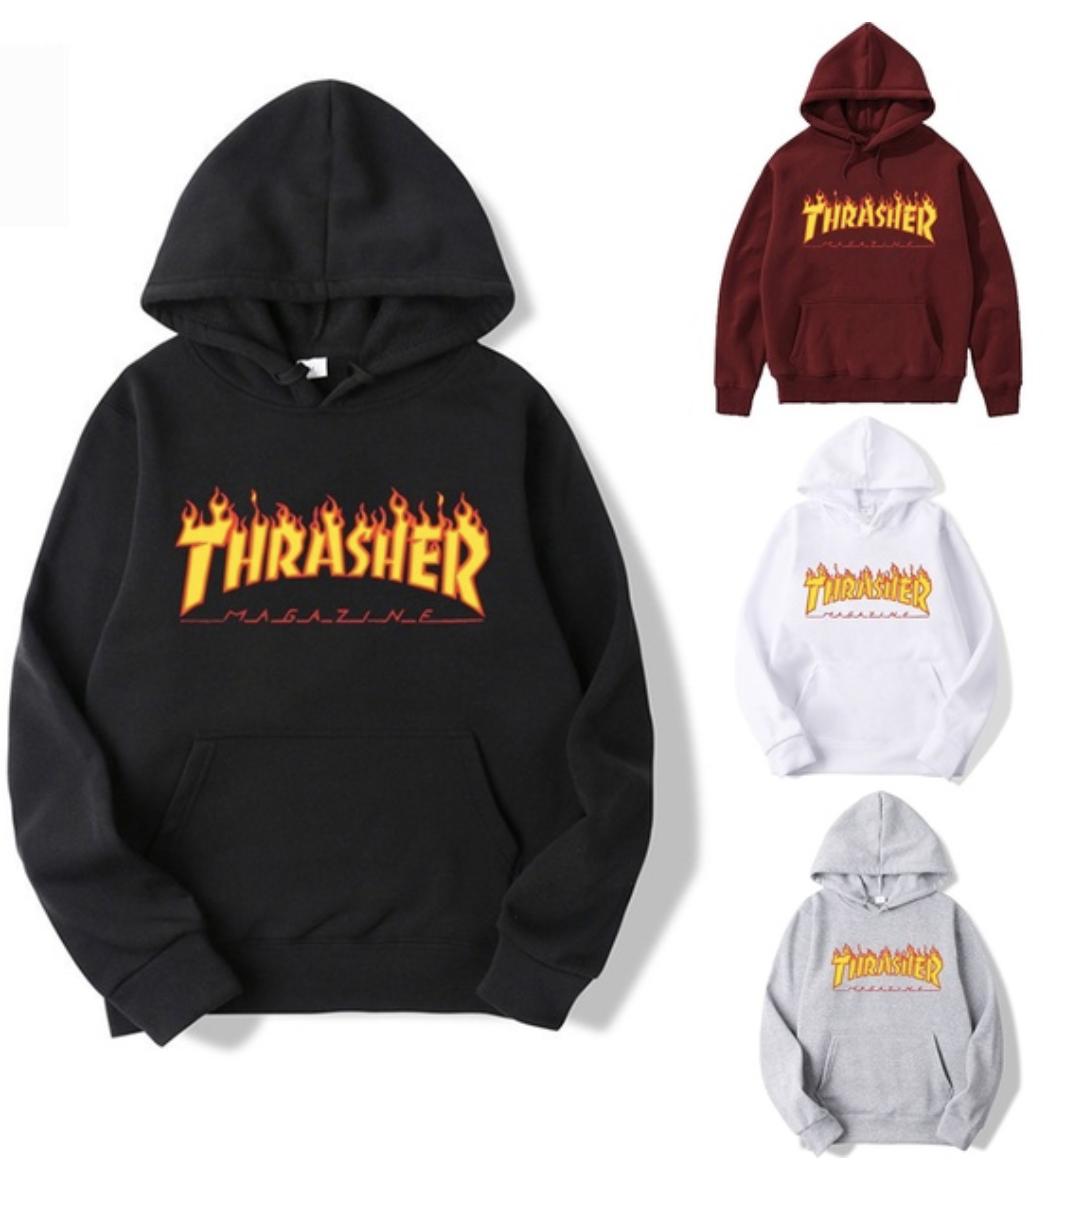 wish hoodie review